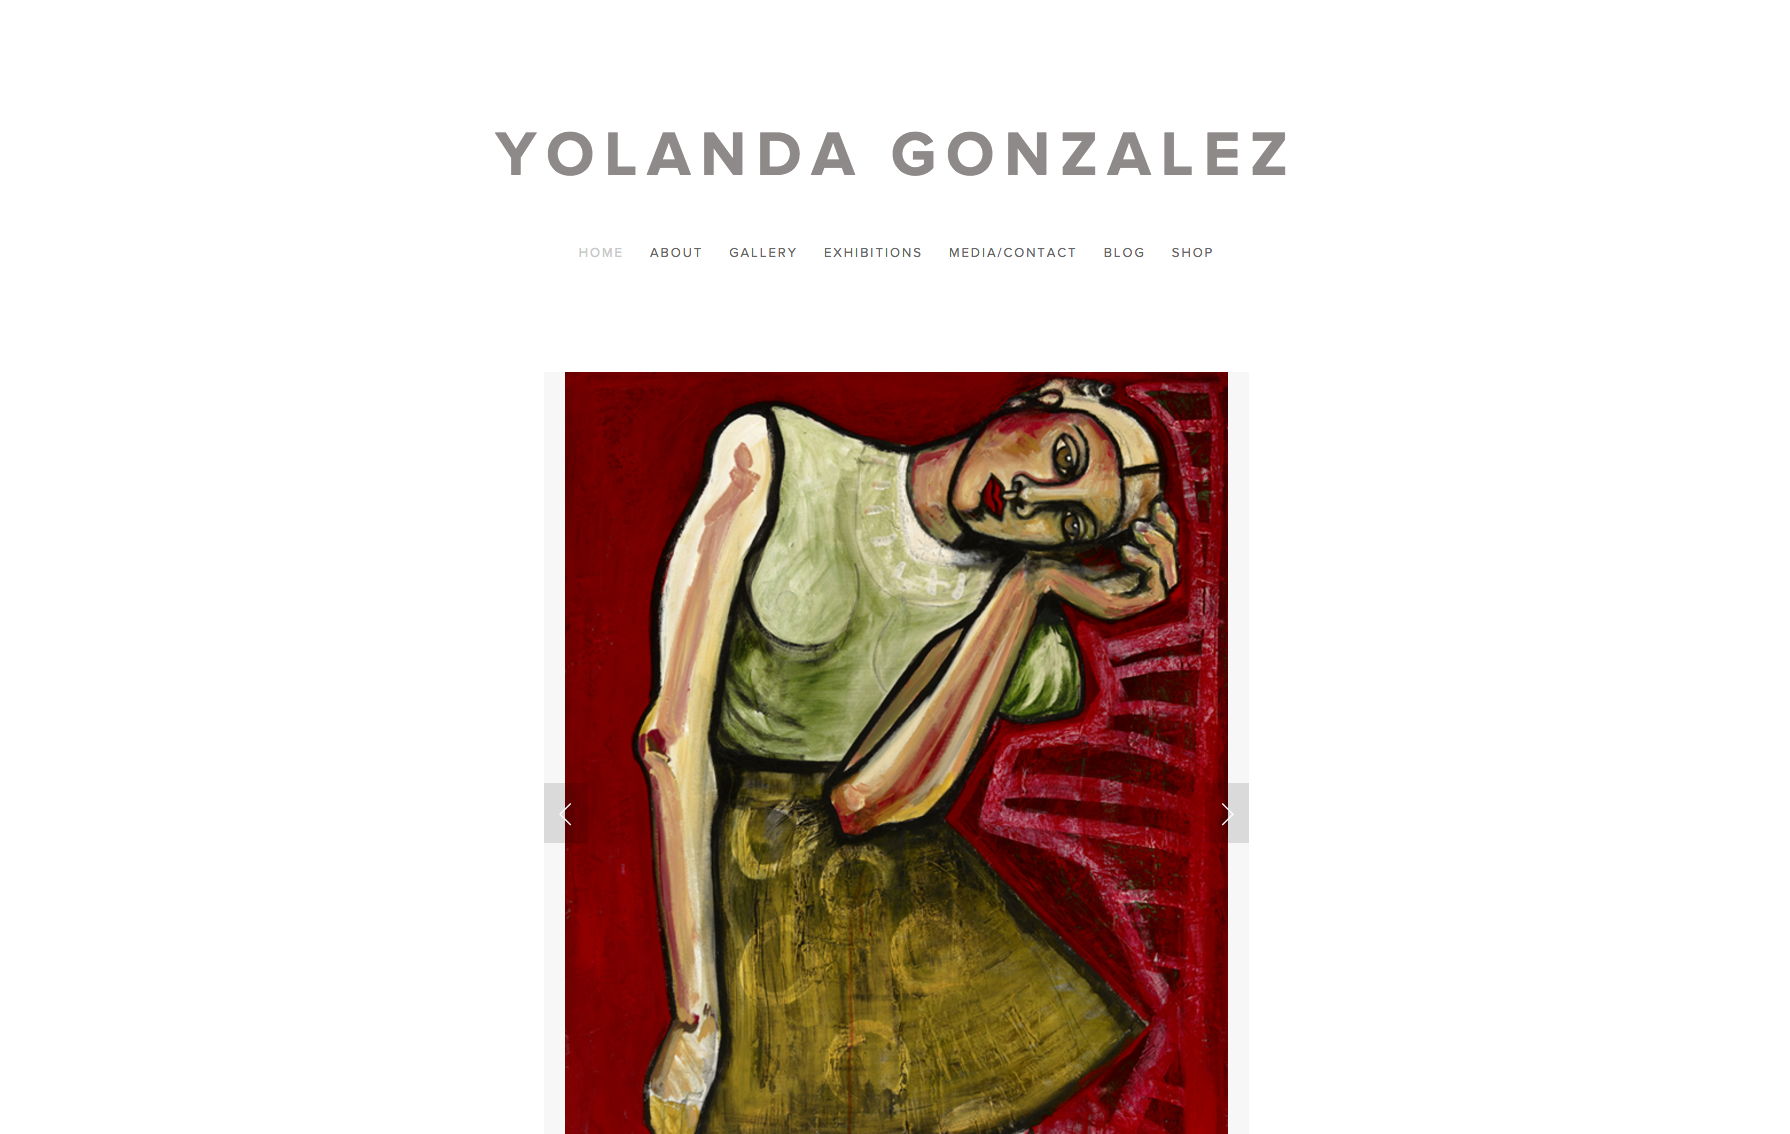 The Art of Yolanda Gonzalez